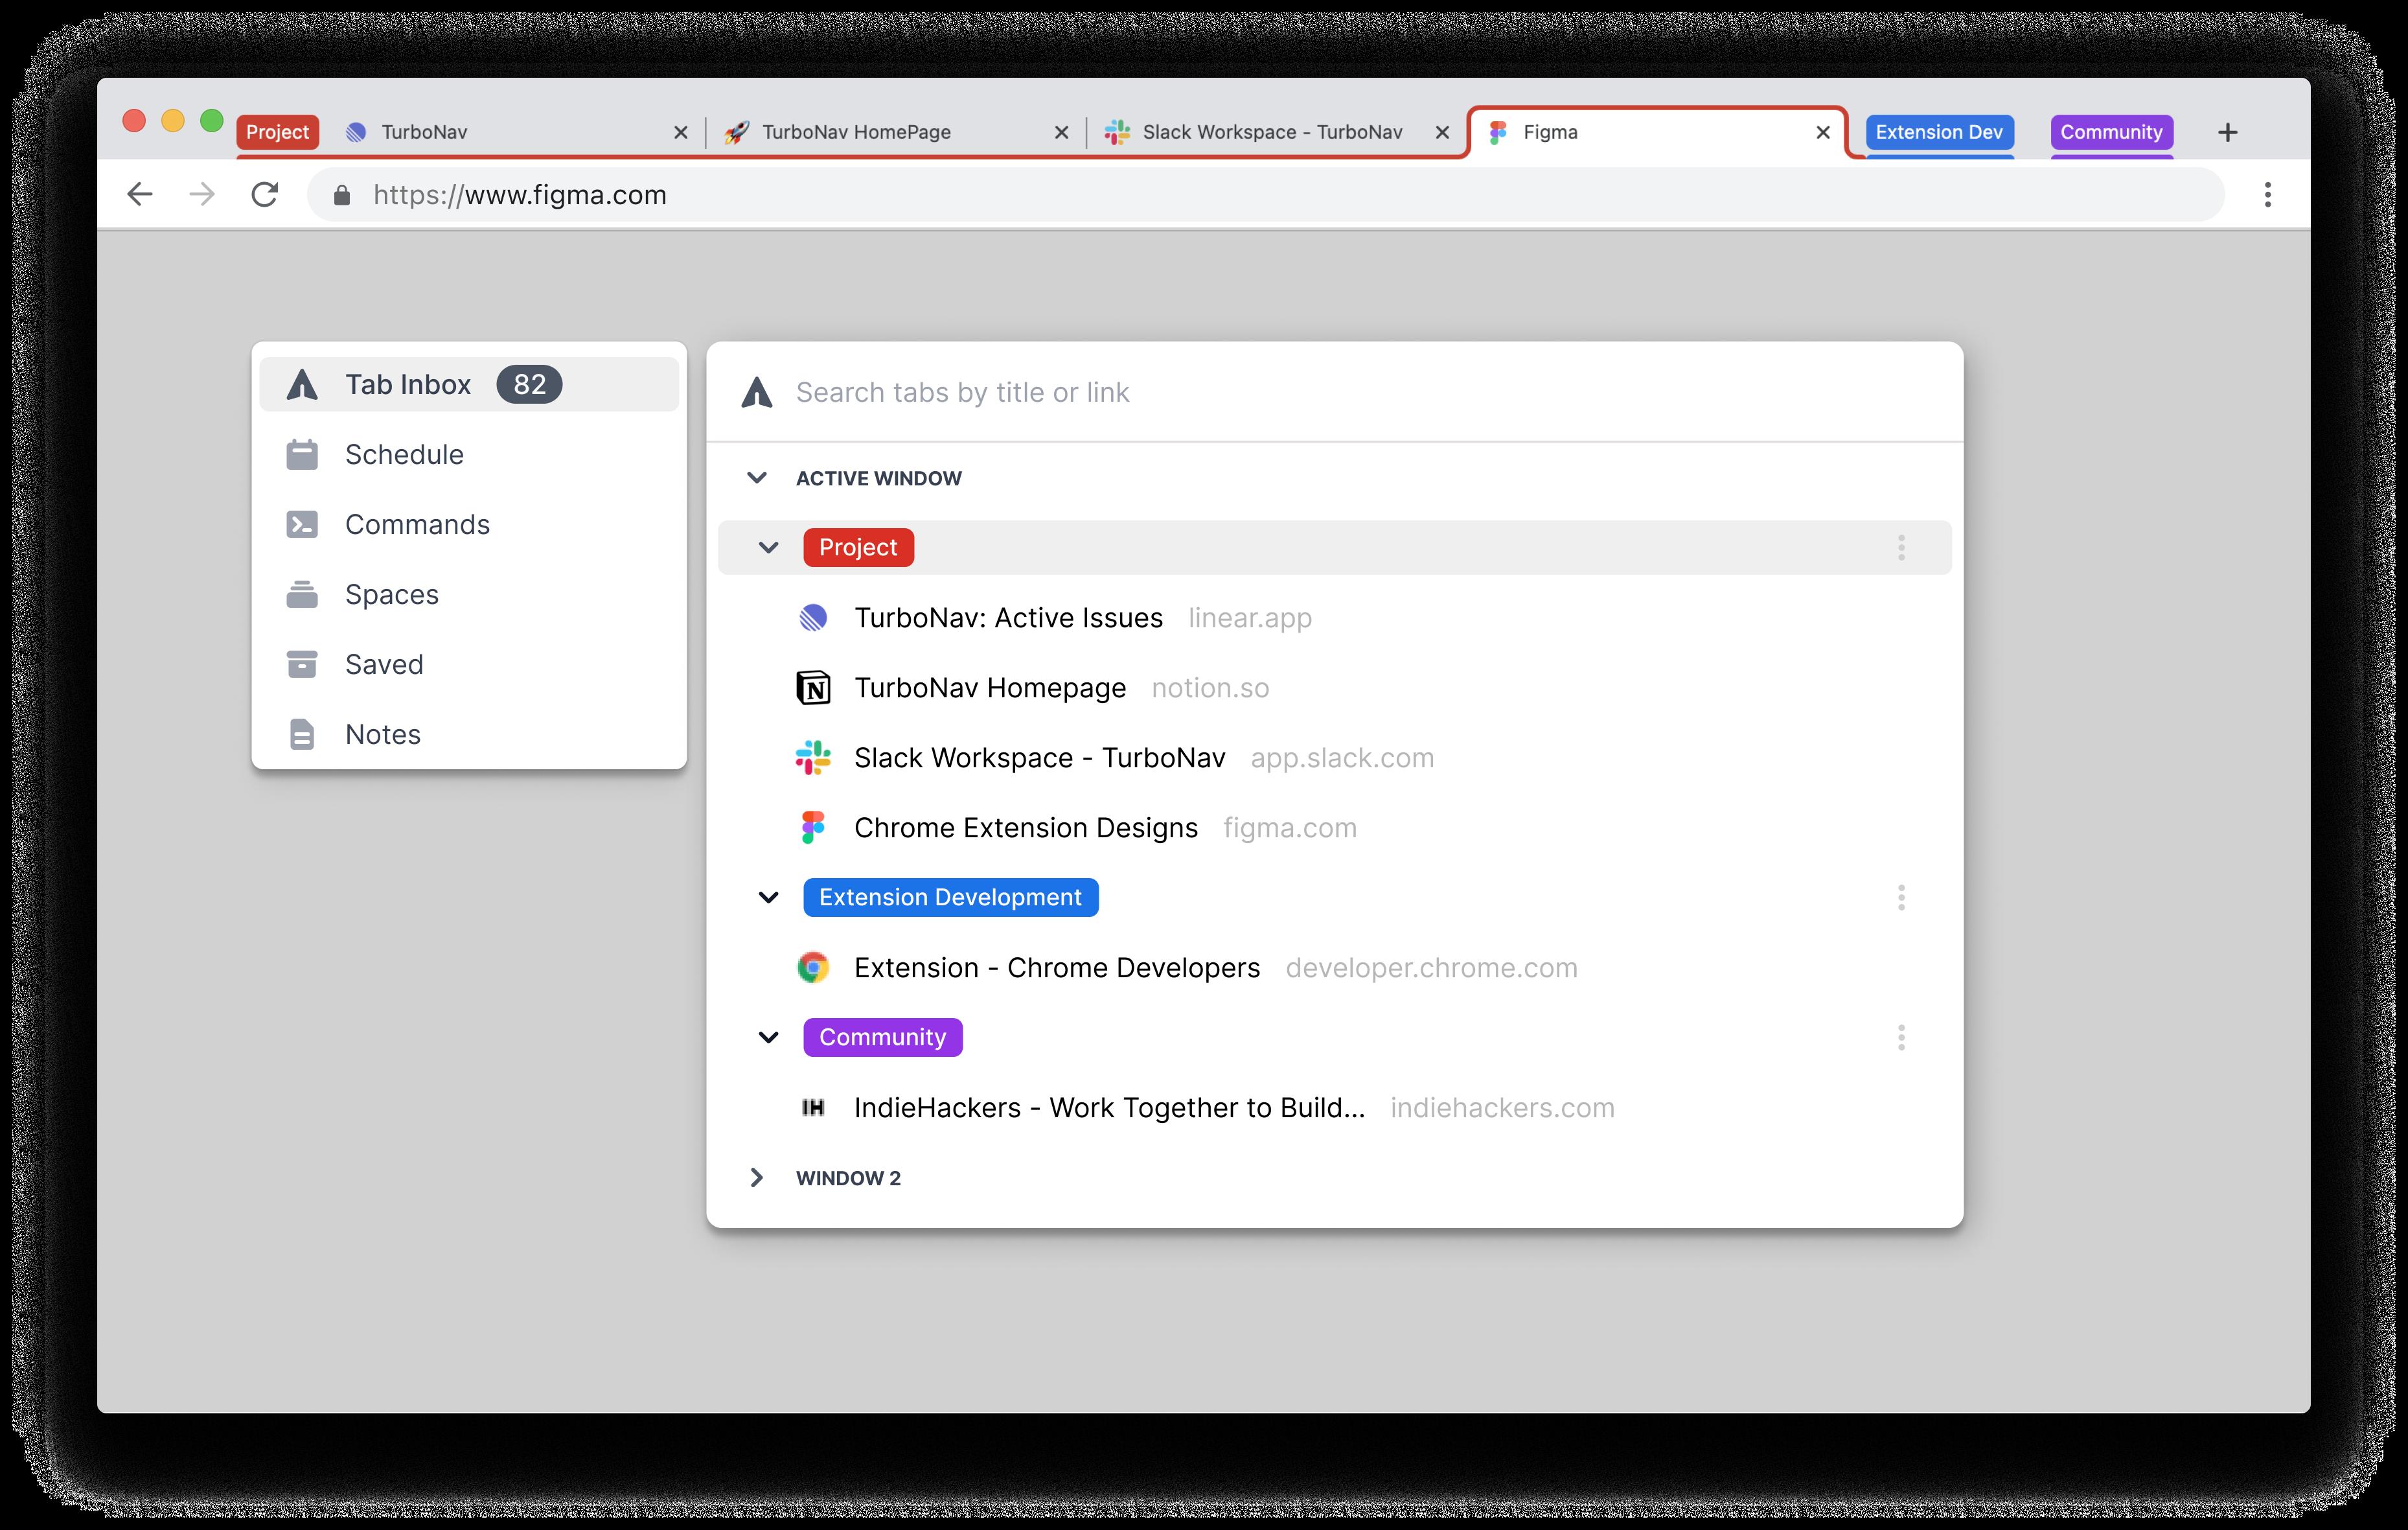 TurboNav Tab Inbox Screenshot